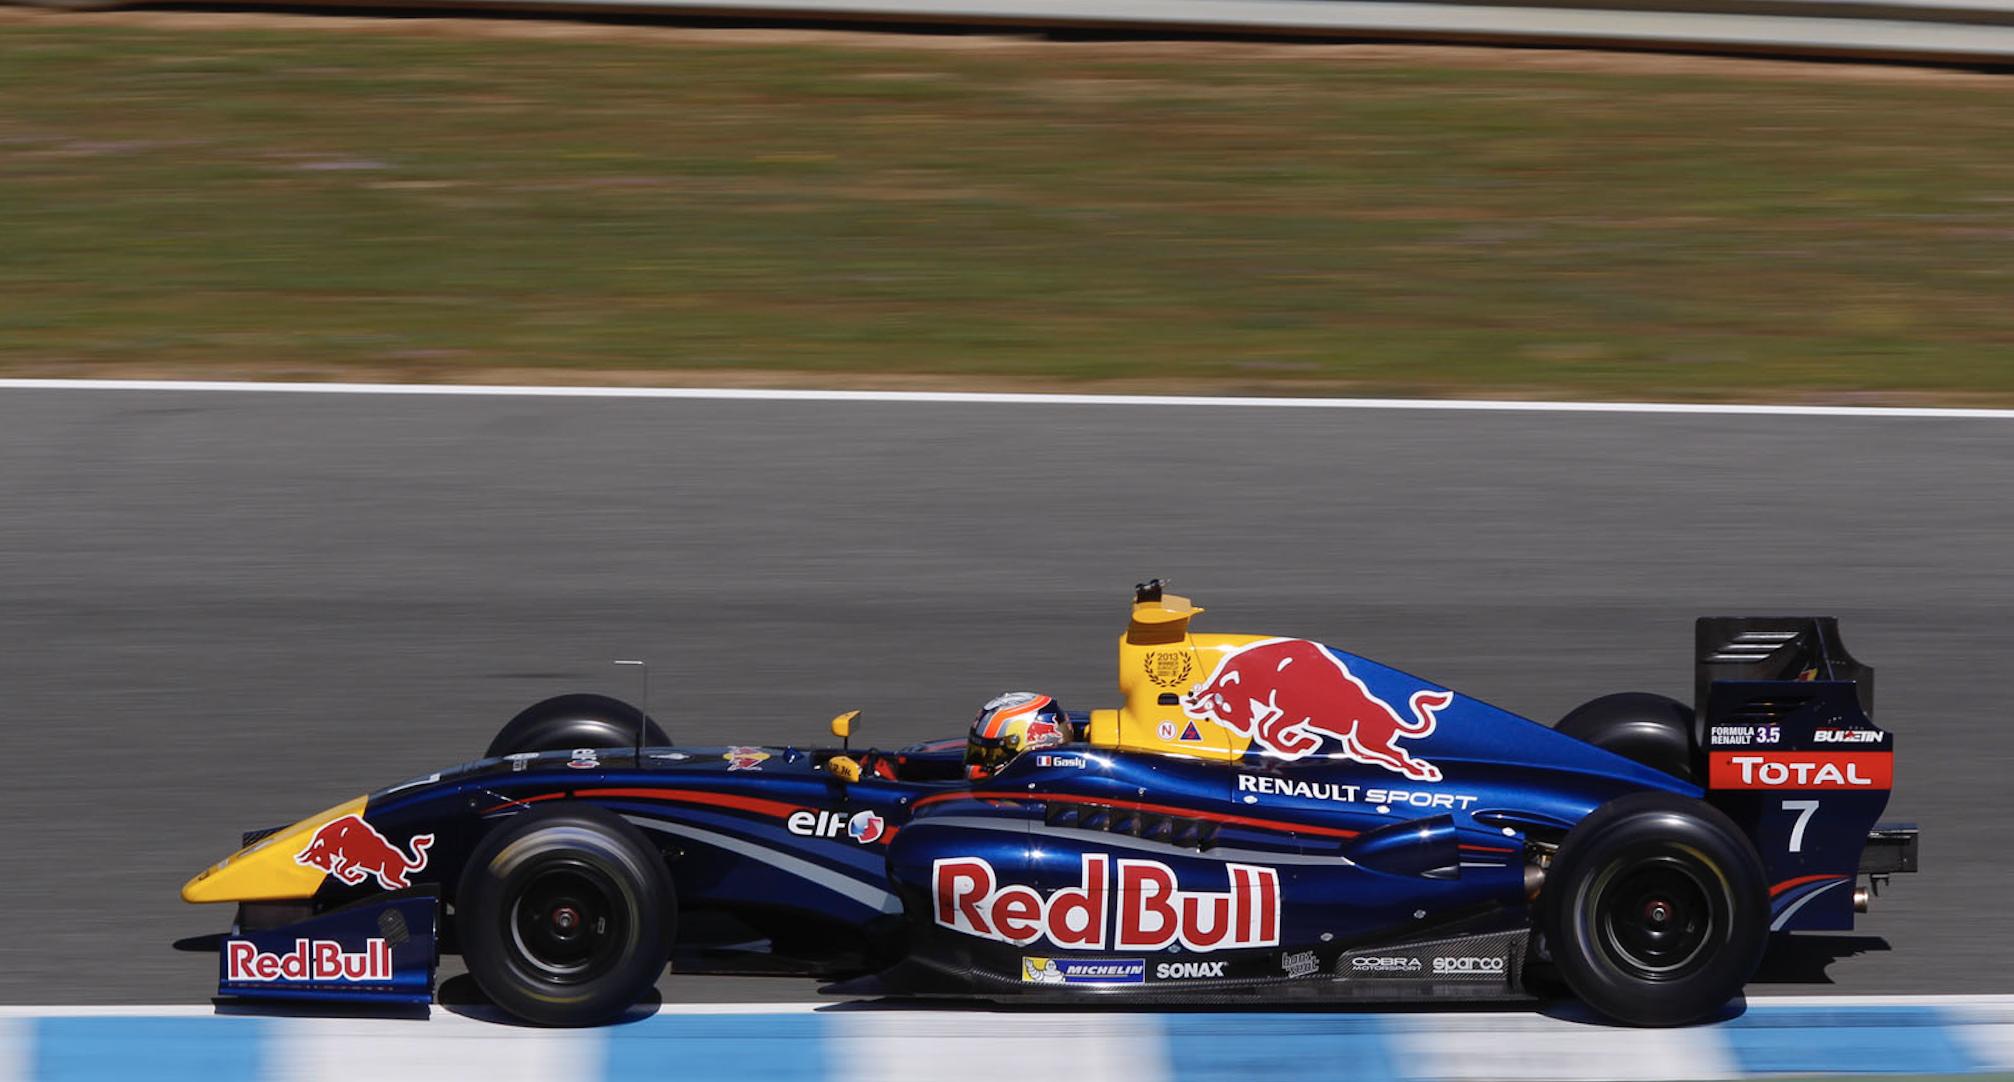 Pierre Gasly - Formula Renault 3.5